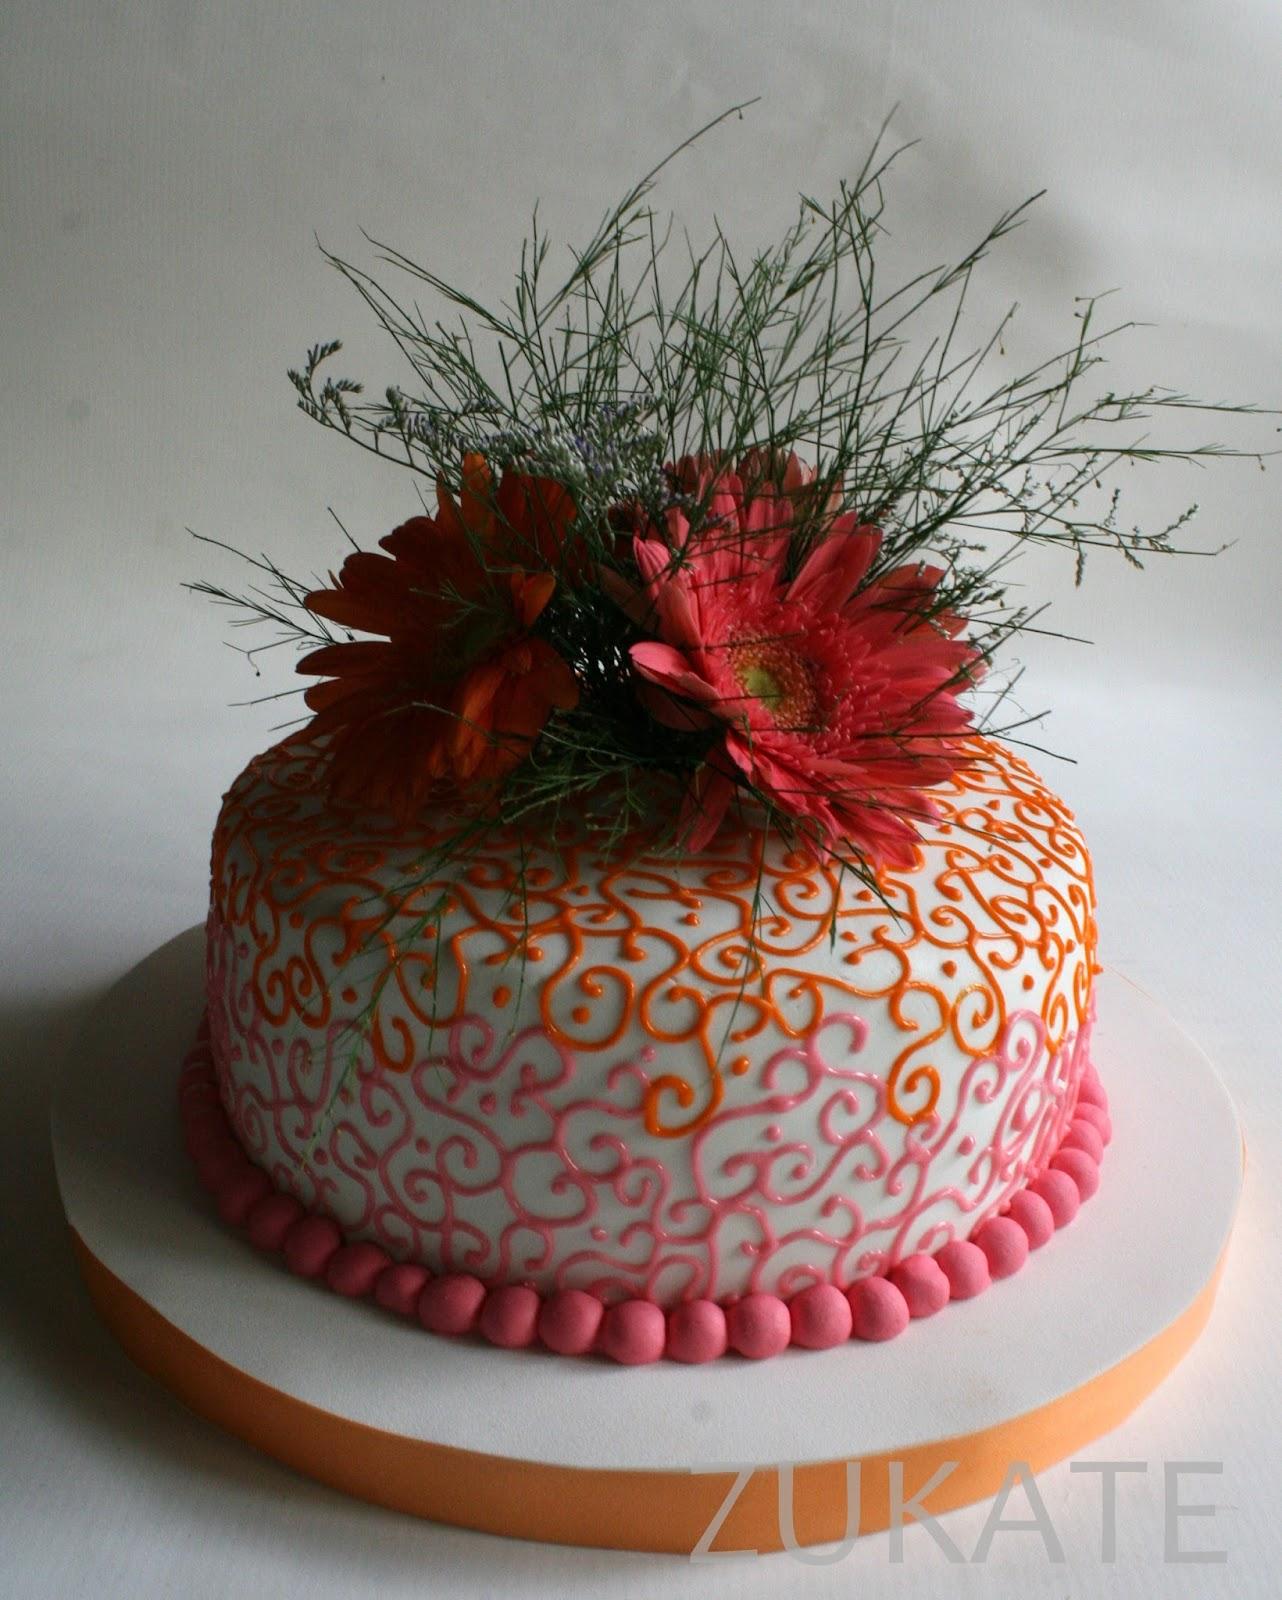 Torta De Flores Naturales Para Sandra Zukate